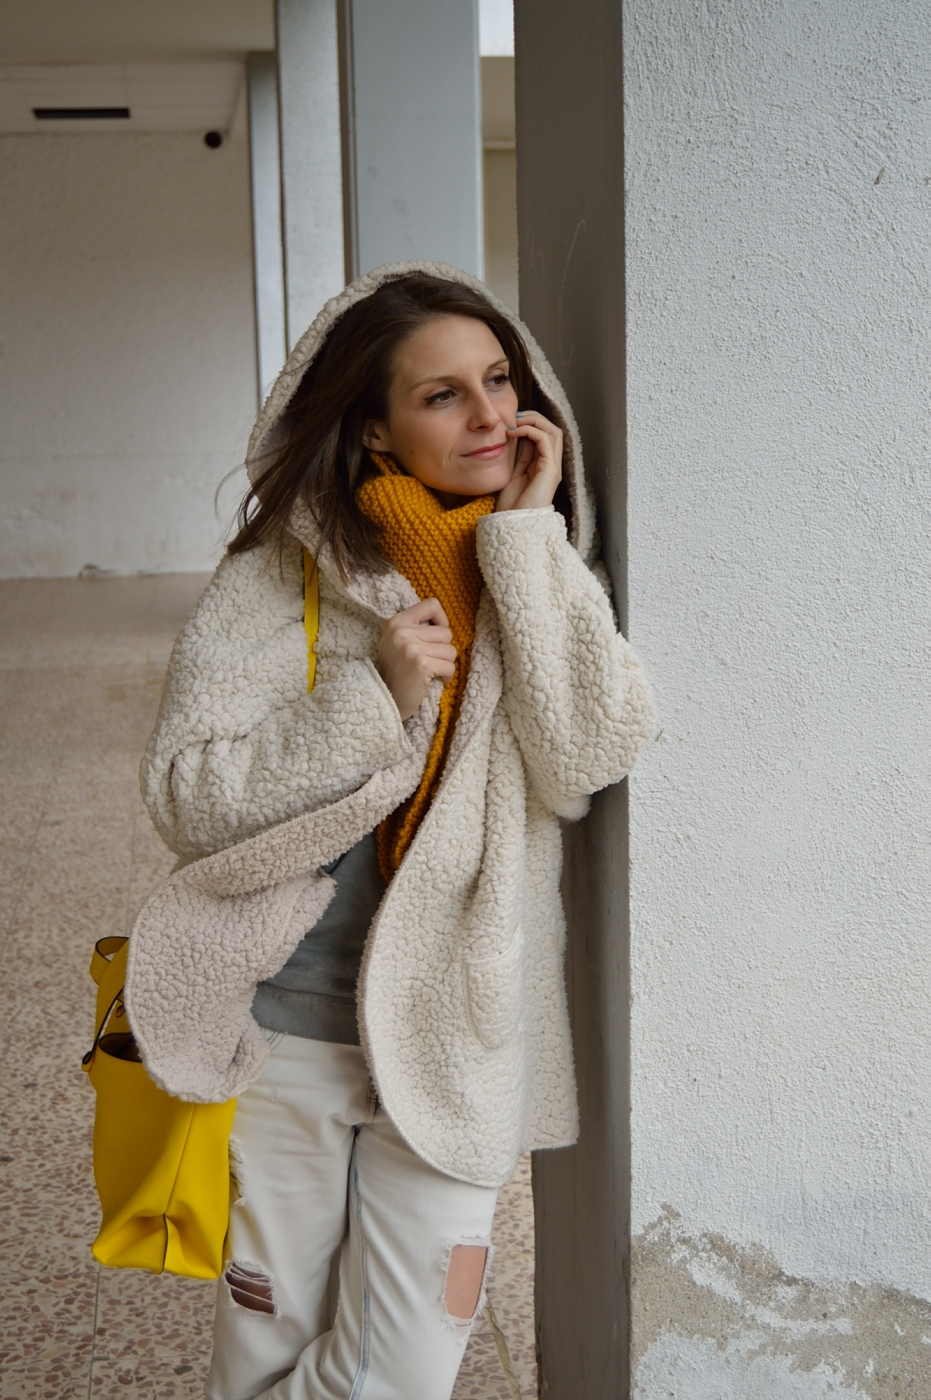 lara-vazquez-mad-lula-style-white-pop-of-yellow